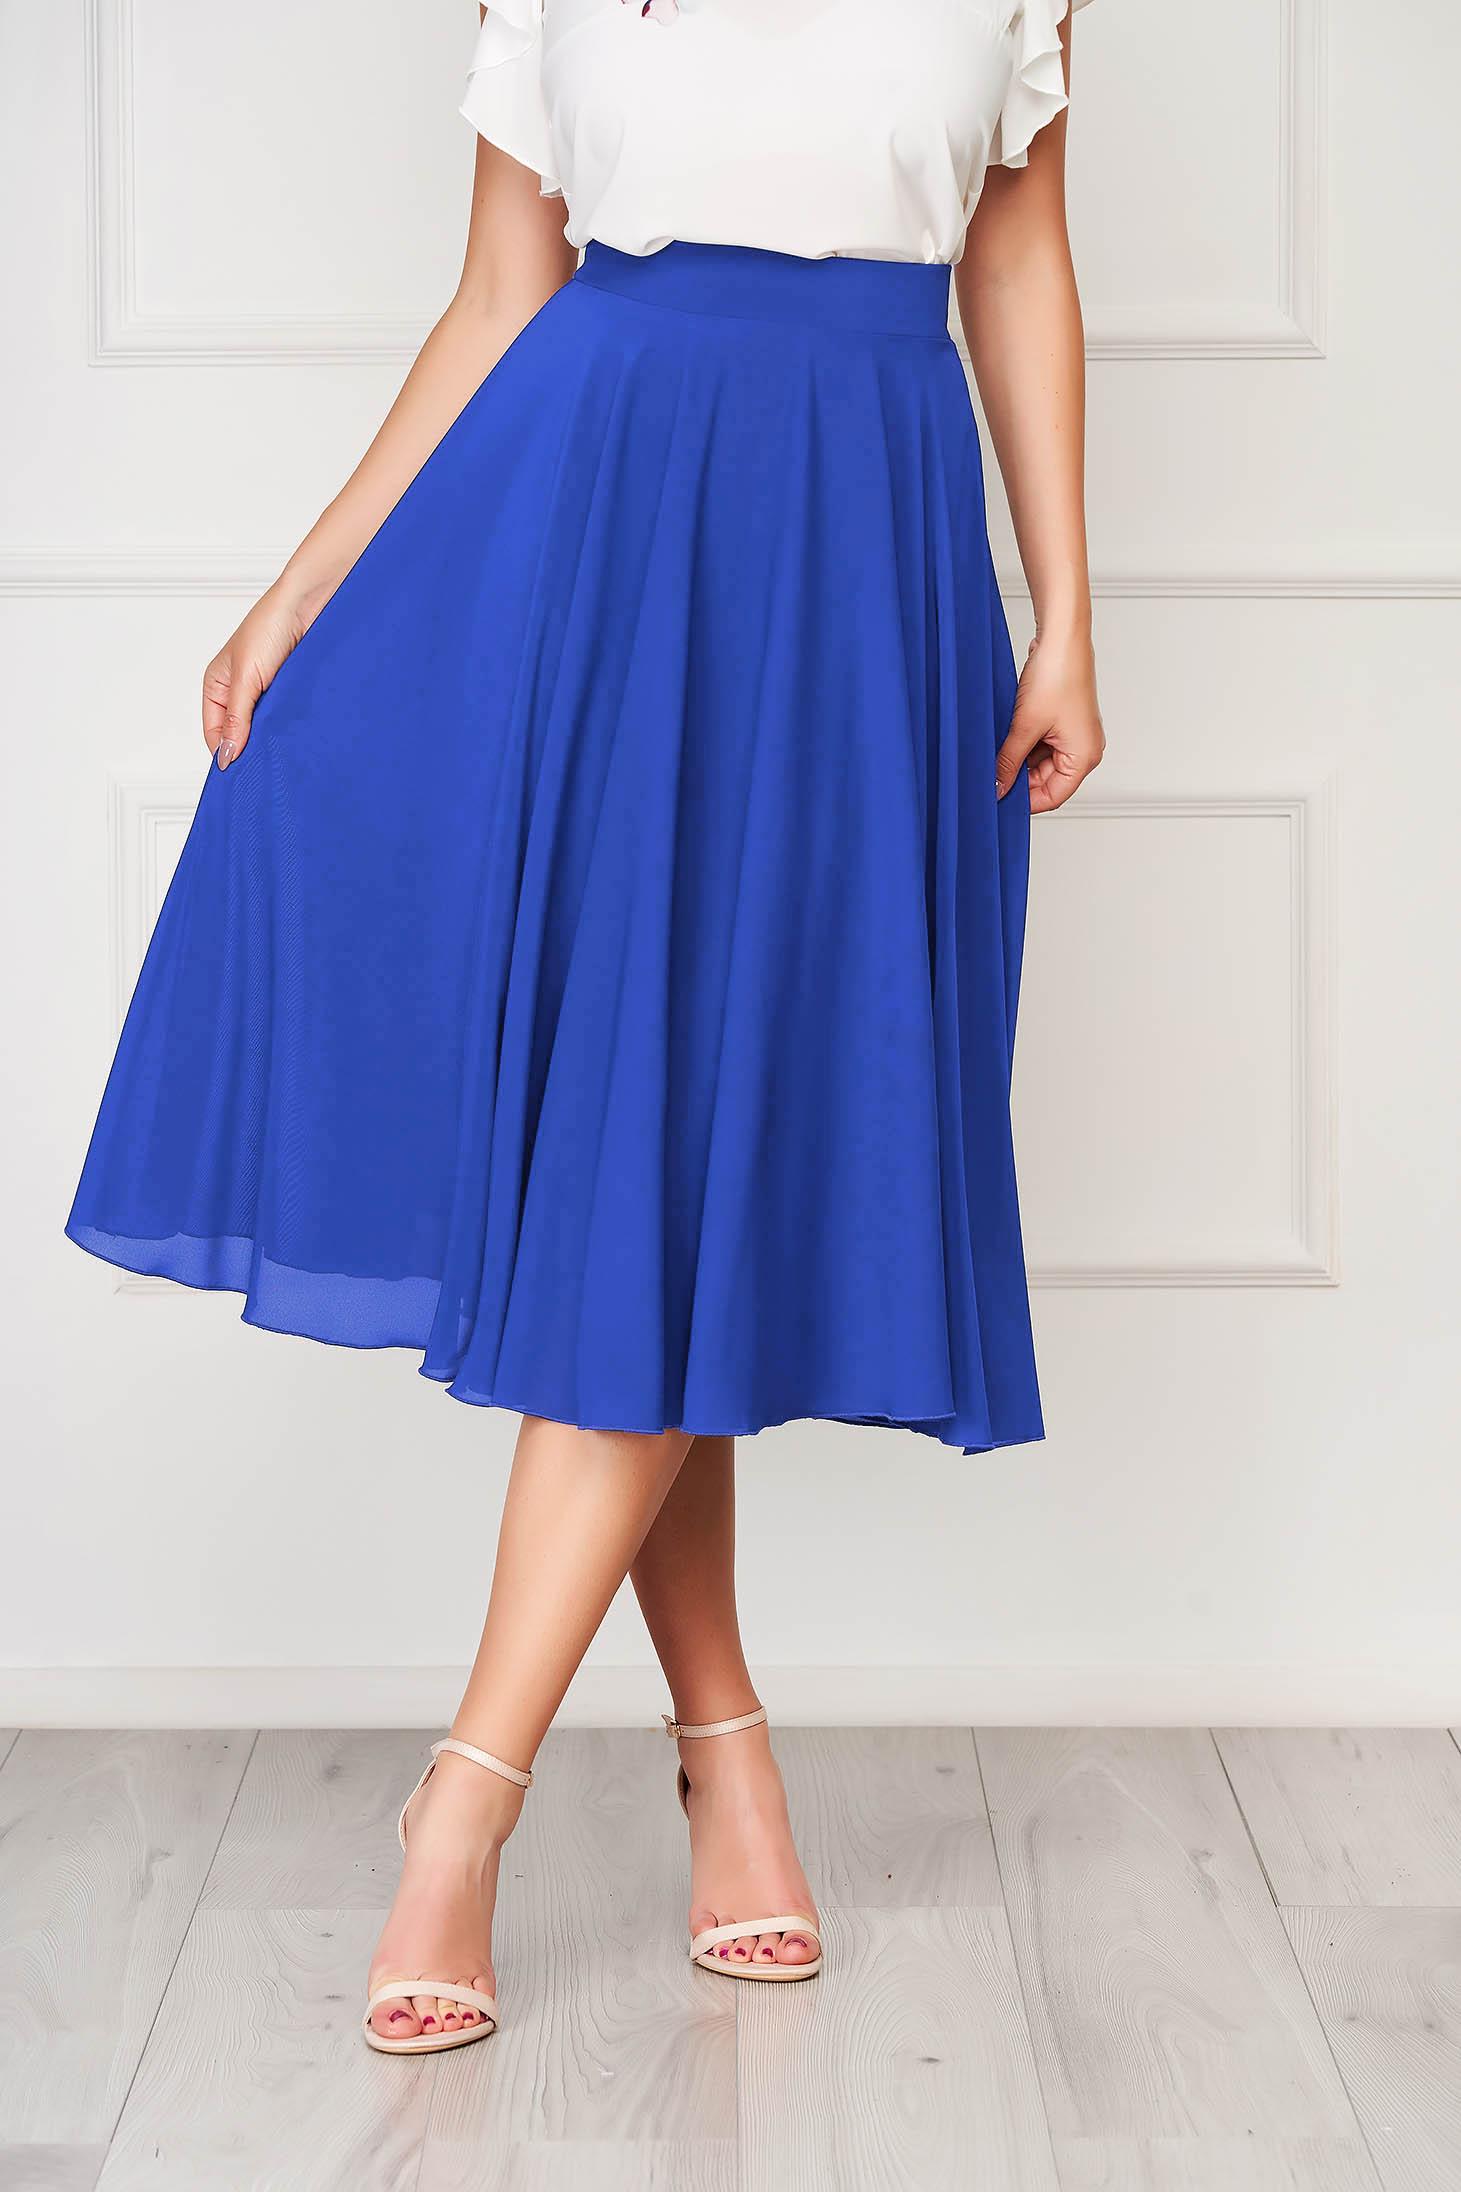 StarShinerS blue skirt elegant midi cloche from veil fabric high waisted